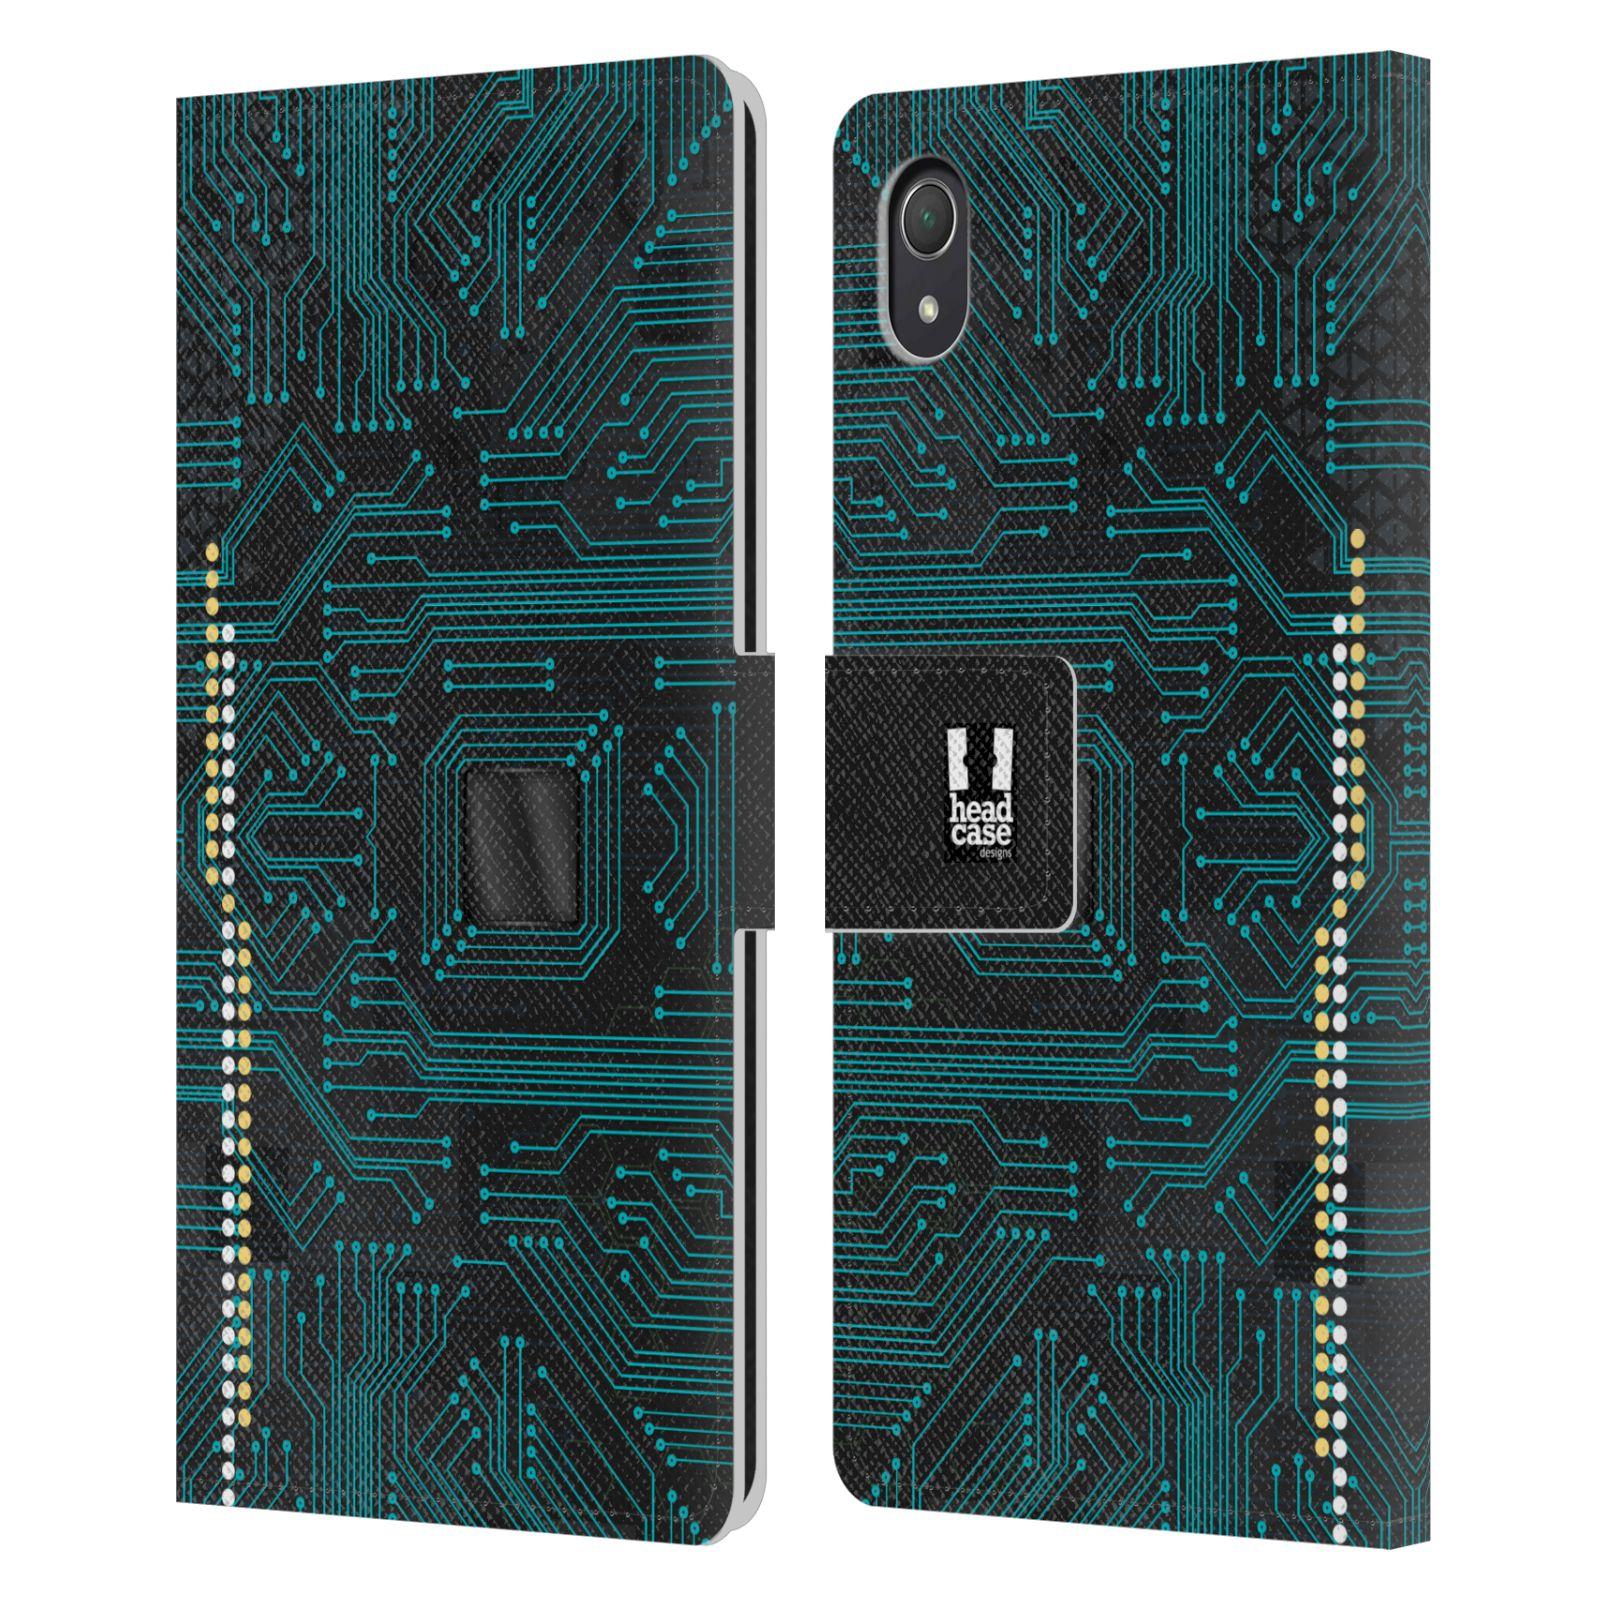 HEAD CASE Flipové pouzdro pro mobil SONY XPERIA Z2 počítač základní deska modrá barva